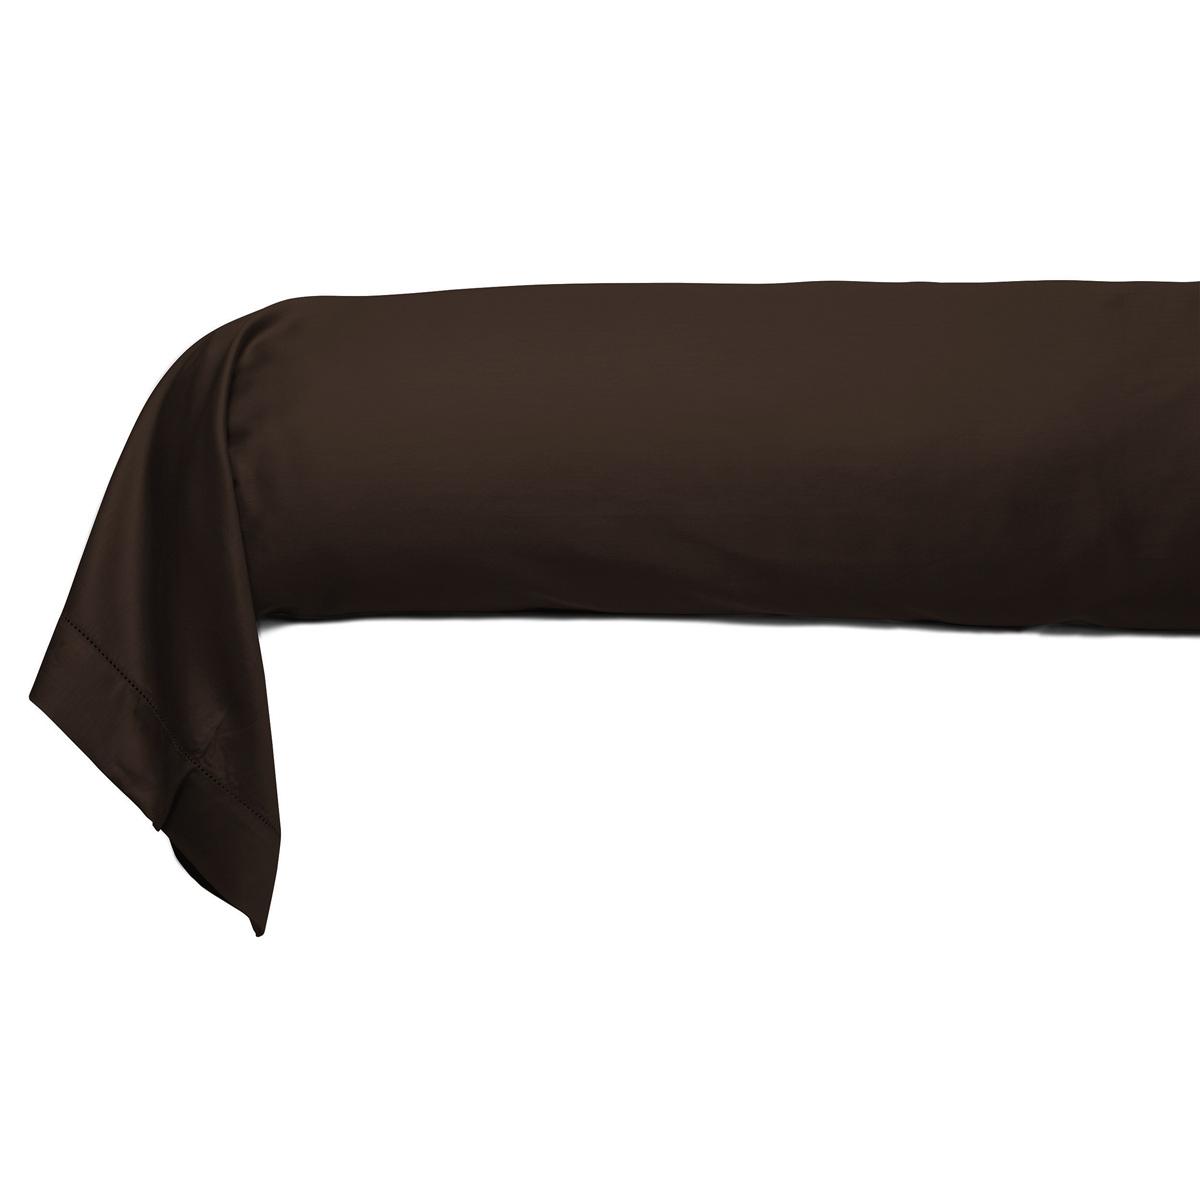 taie traversin unie satin jacquard soldes jusqu 39 55. Black Bedroom Furniture Sets. Home Design Ideas